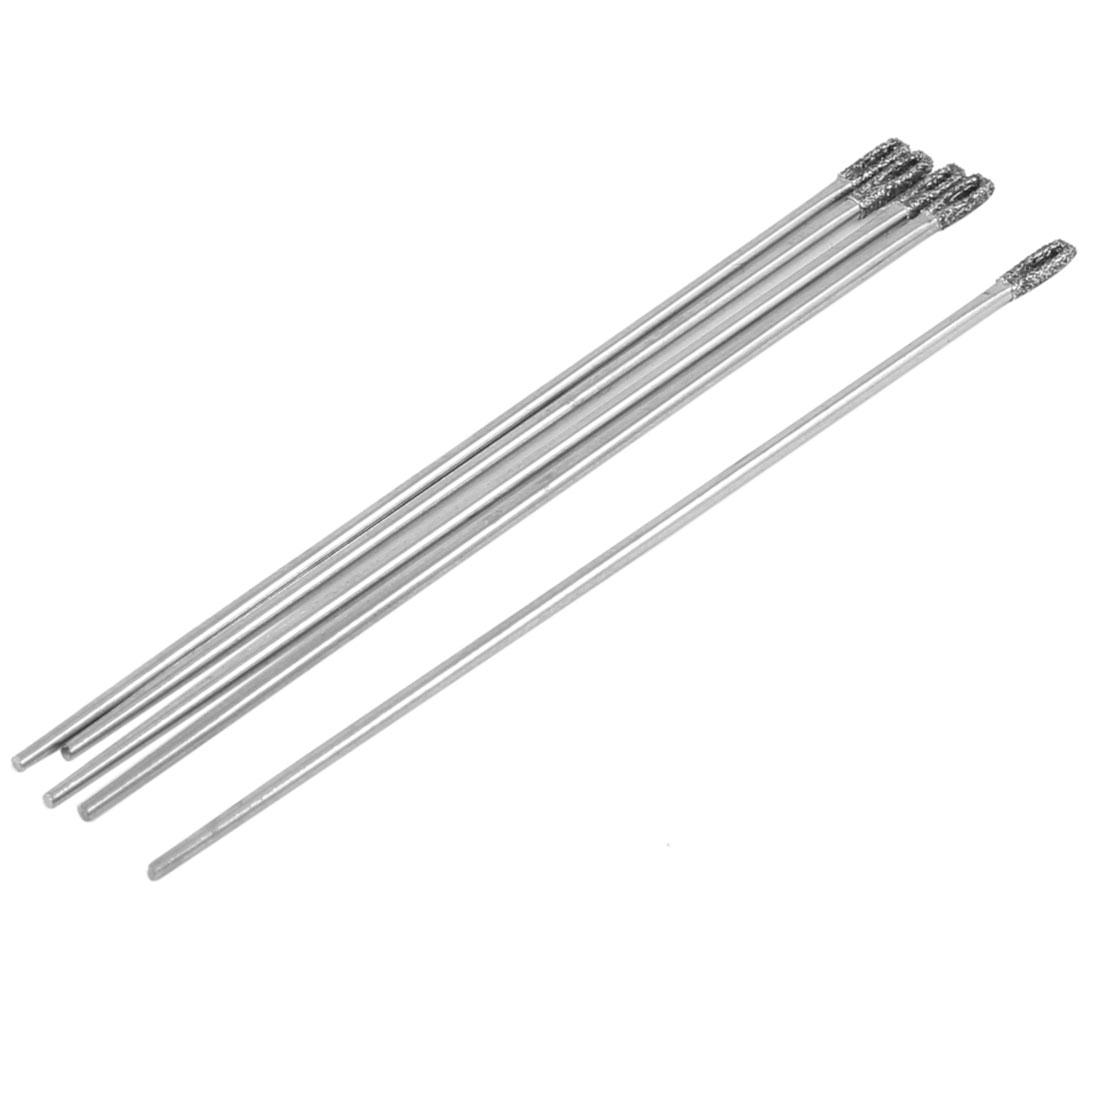 Tailor 1mm Diameter Flat Tip Metal Sewing Needles 5 Pcs